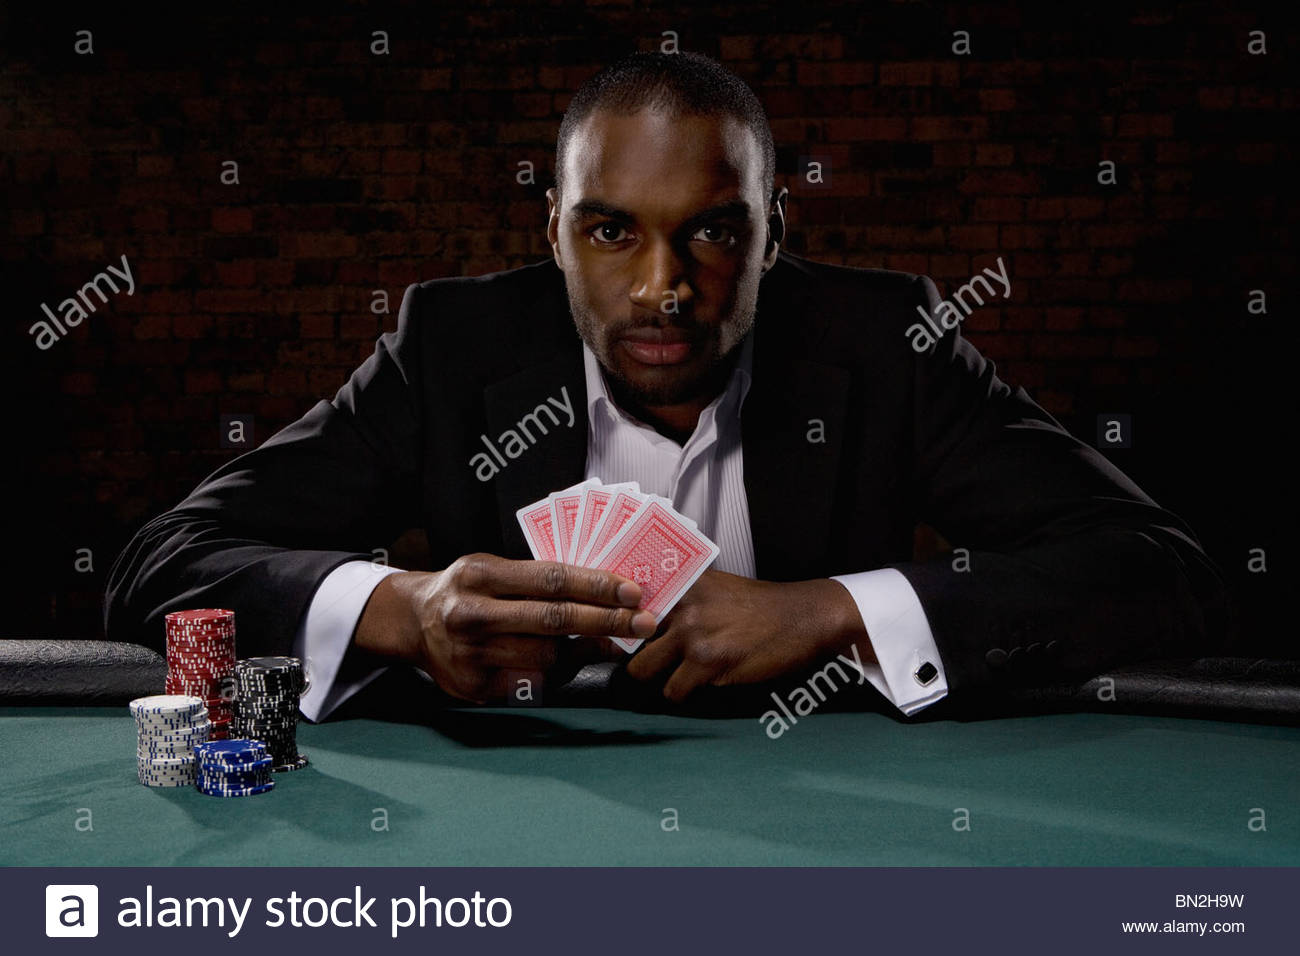 Man playing poker in casino Stock Photo